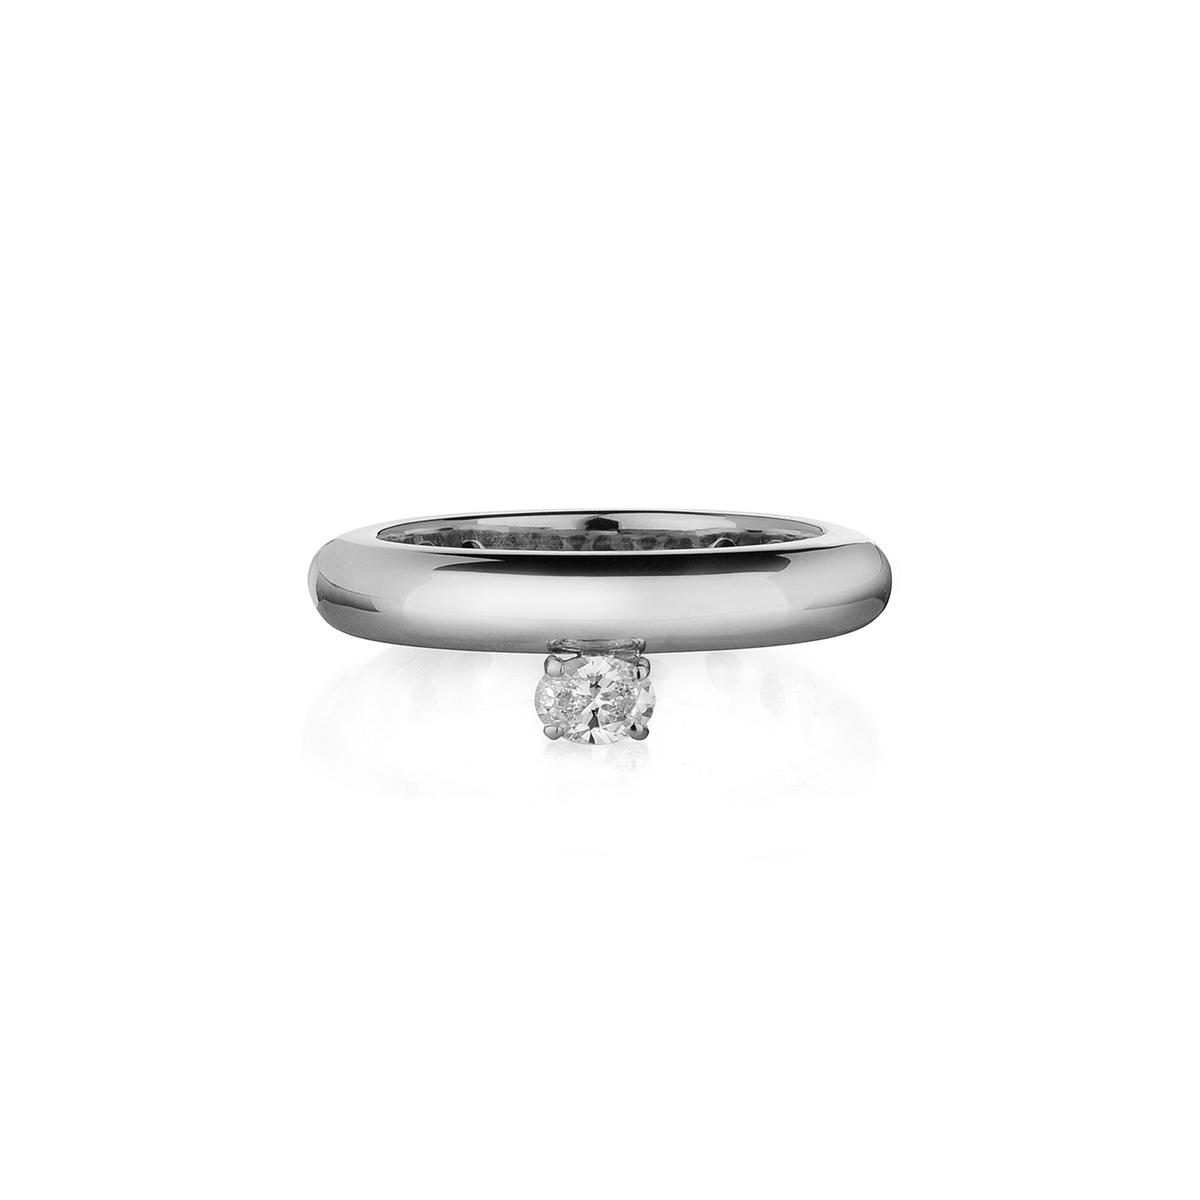 Chubby - Fancy Oval Ring